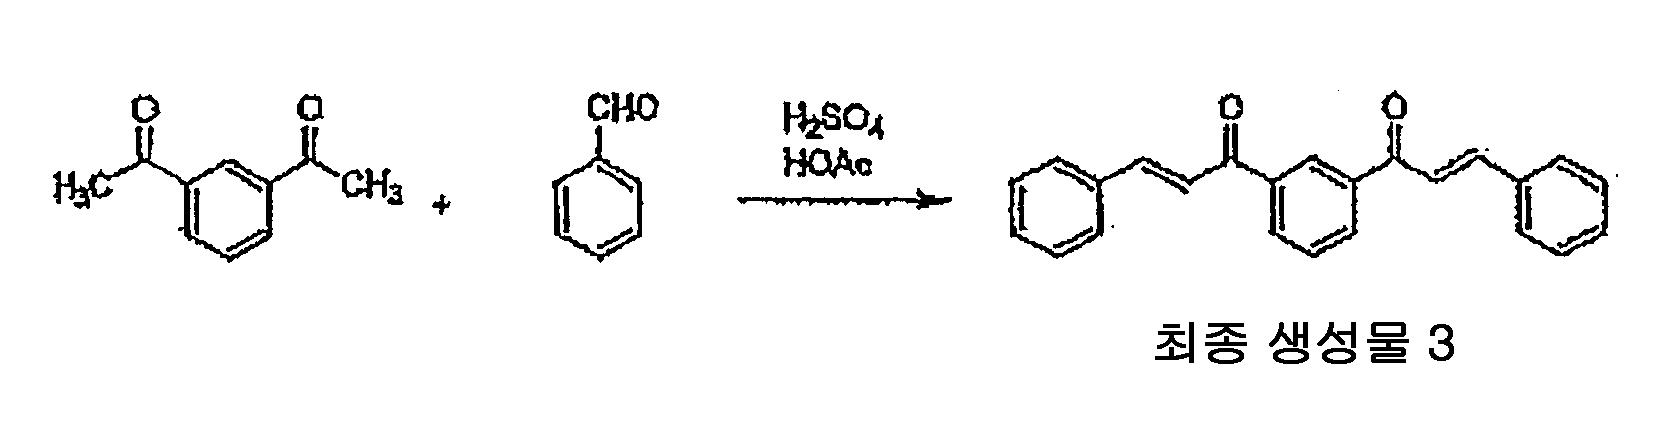 Figure 112010002231902-pat00096